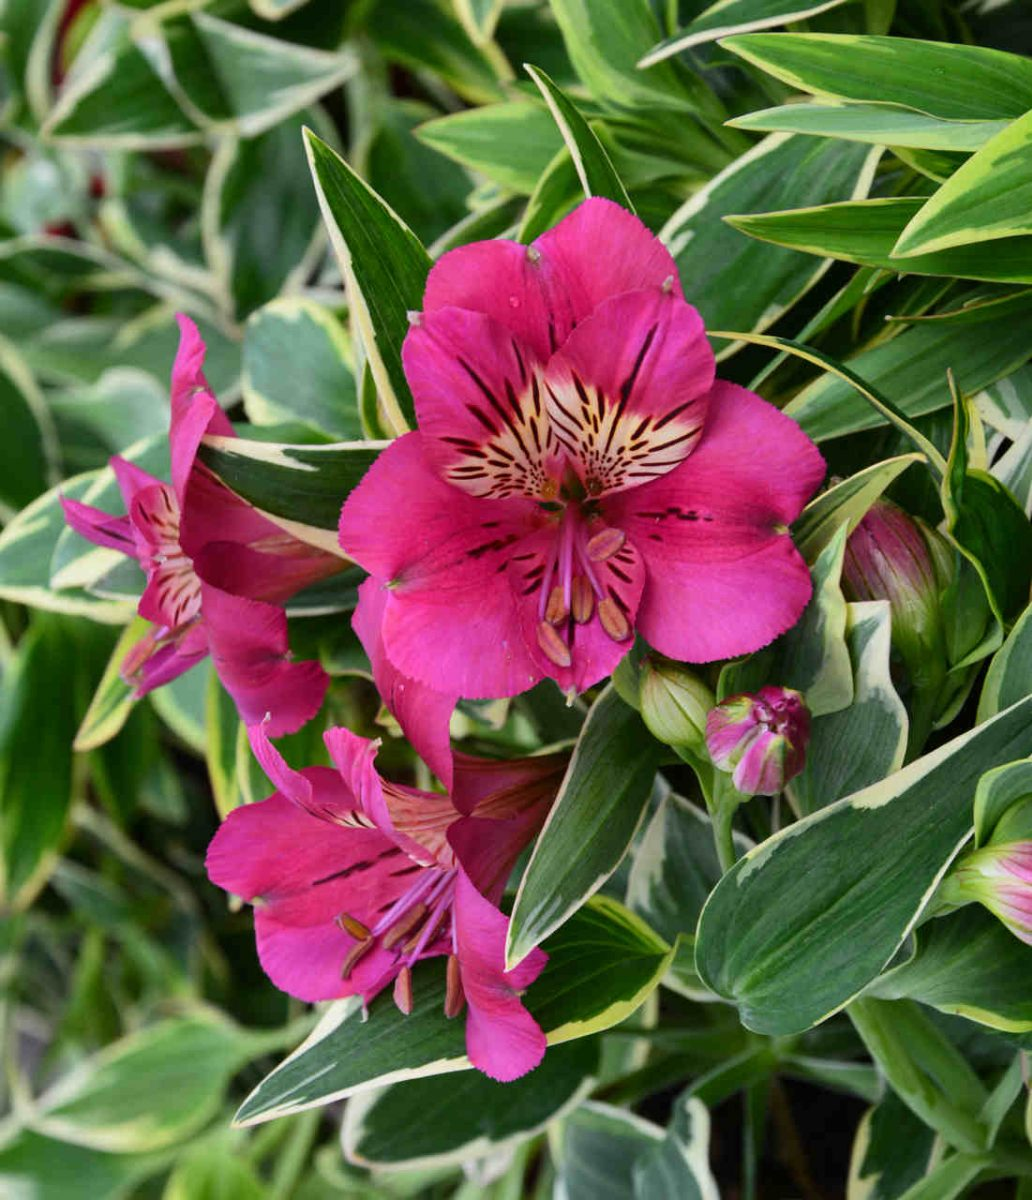 Alstremeria (Alstroemeria) RIVER VALLEY® 'Tessumriver' PBR